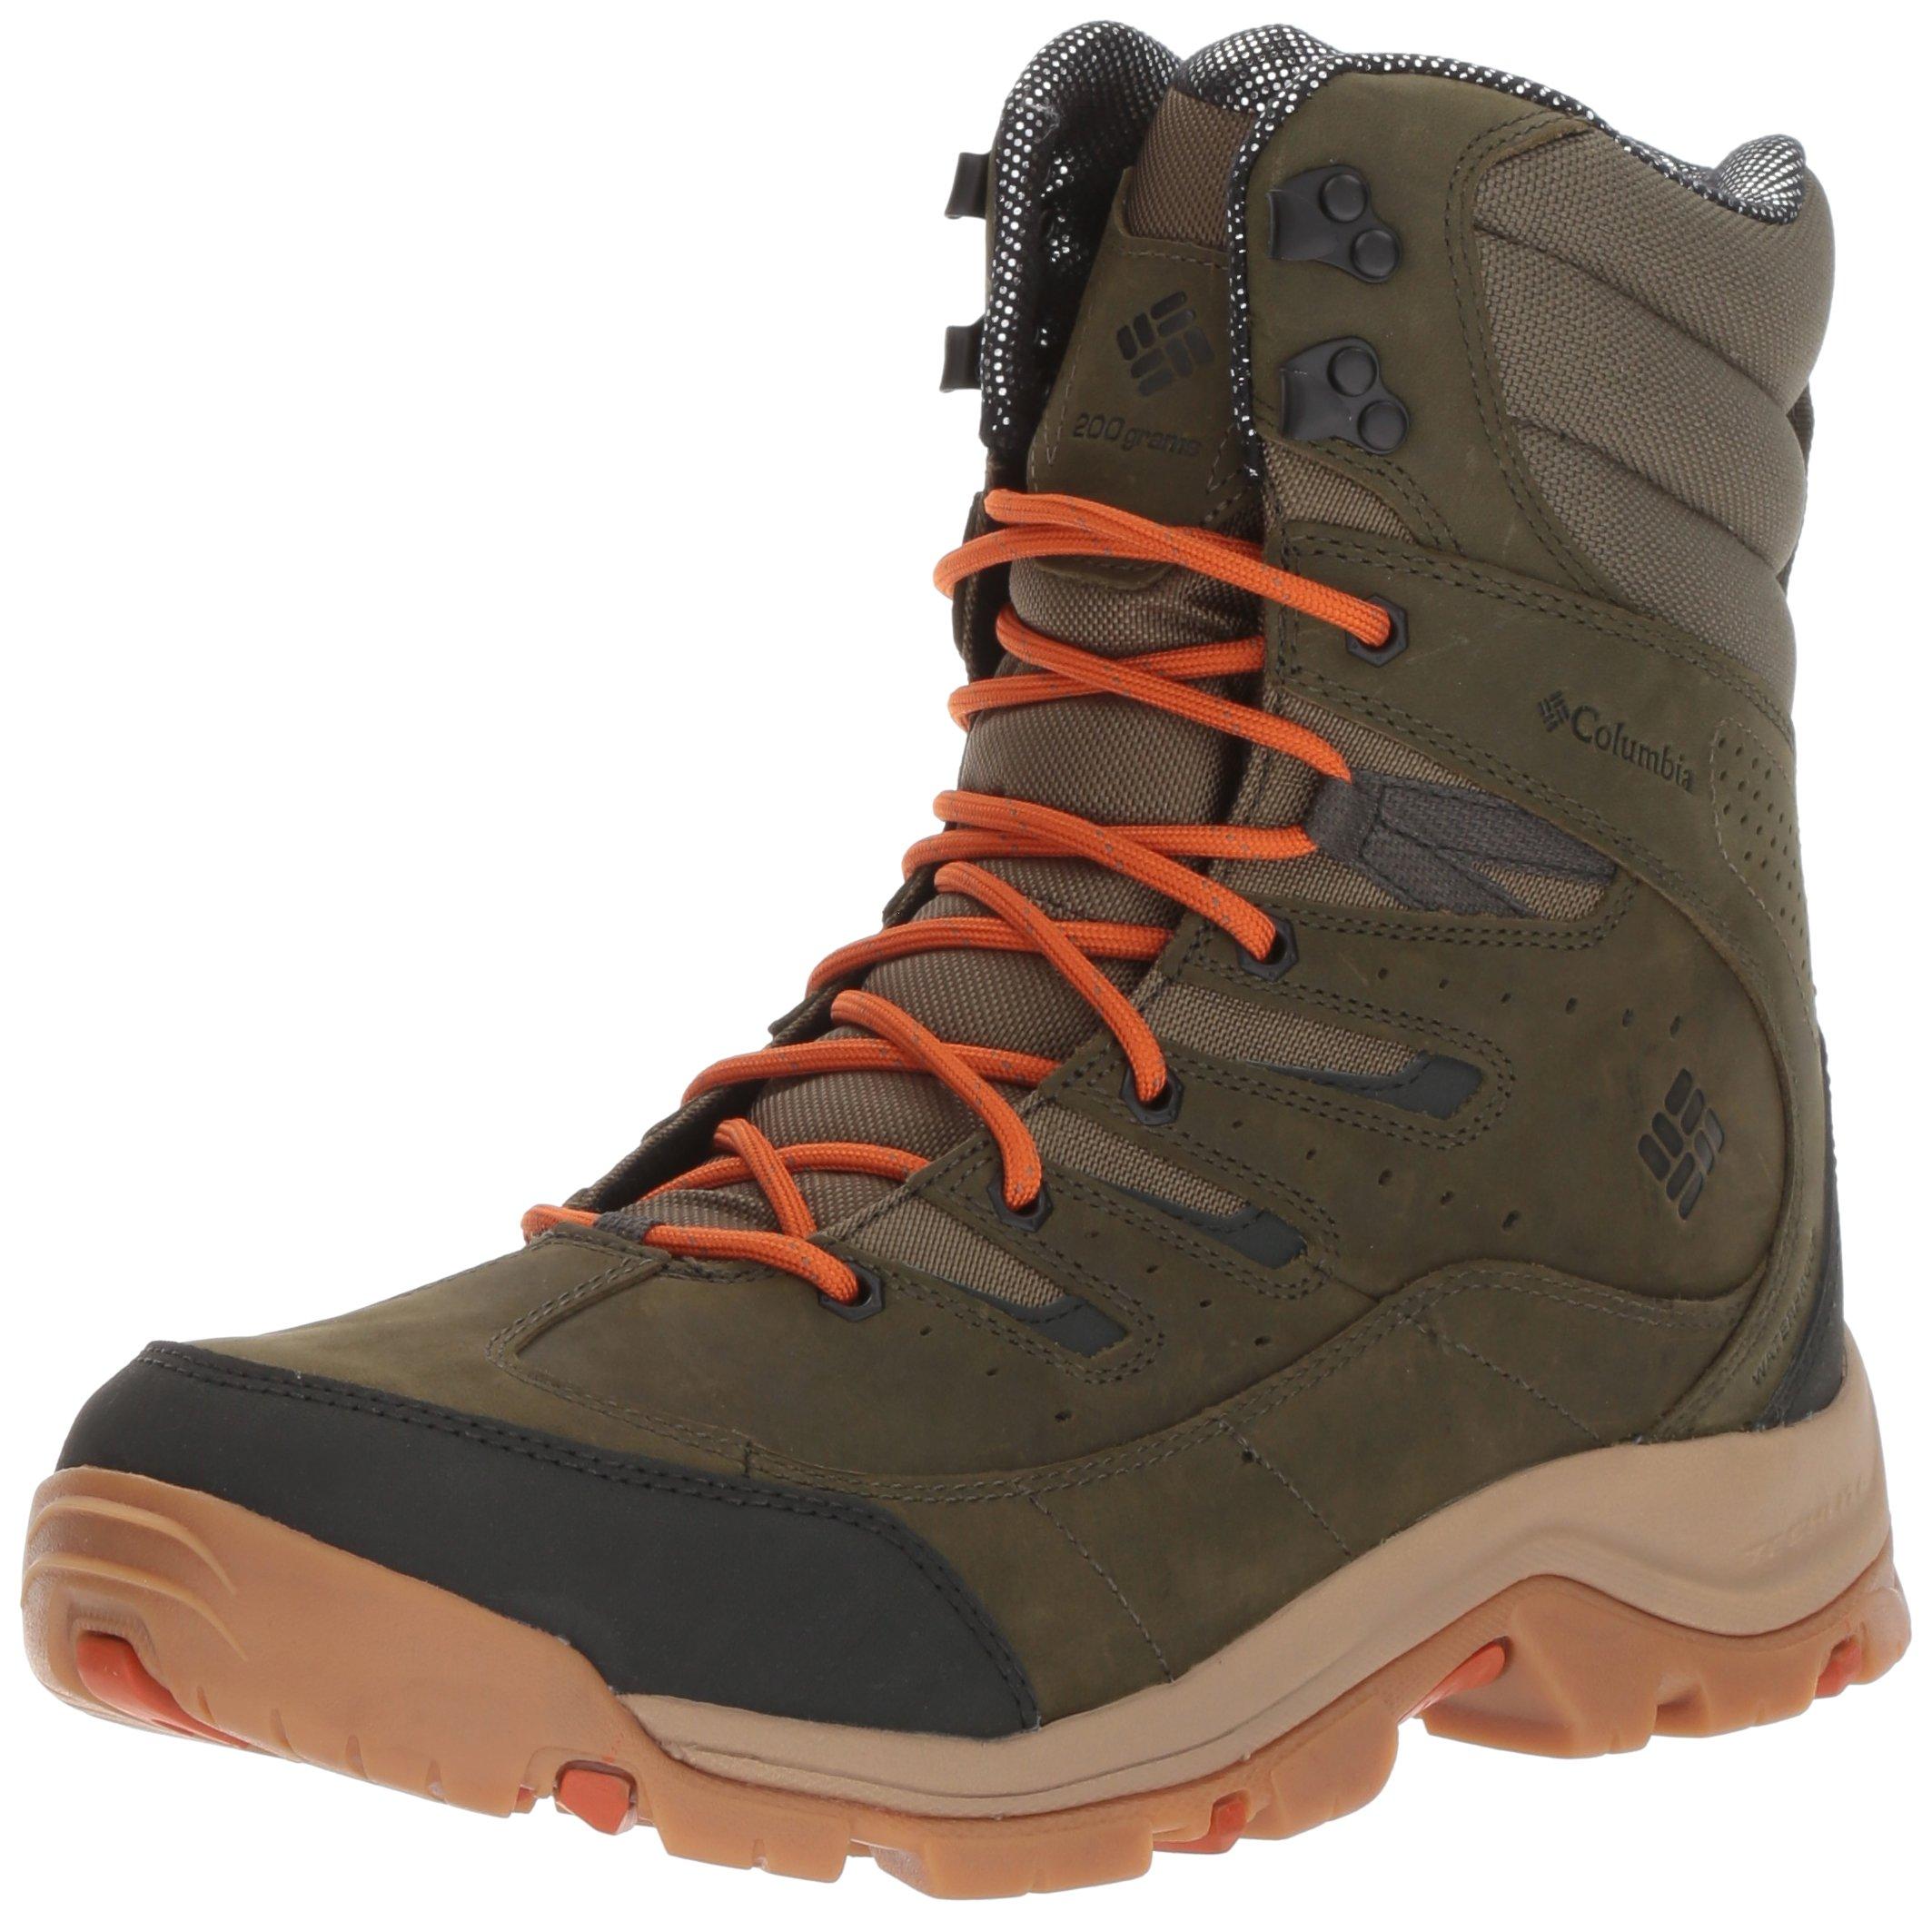 Columbia Men's Gunnison Plus Leather Omni-Heat Hiking Shoe, Nori, Desert Sun, 10 D US by Columbia